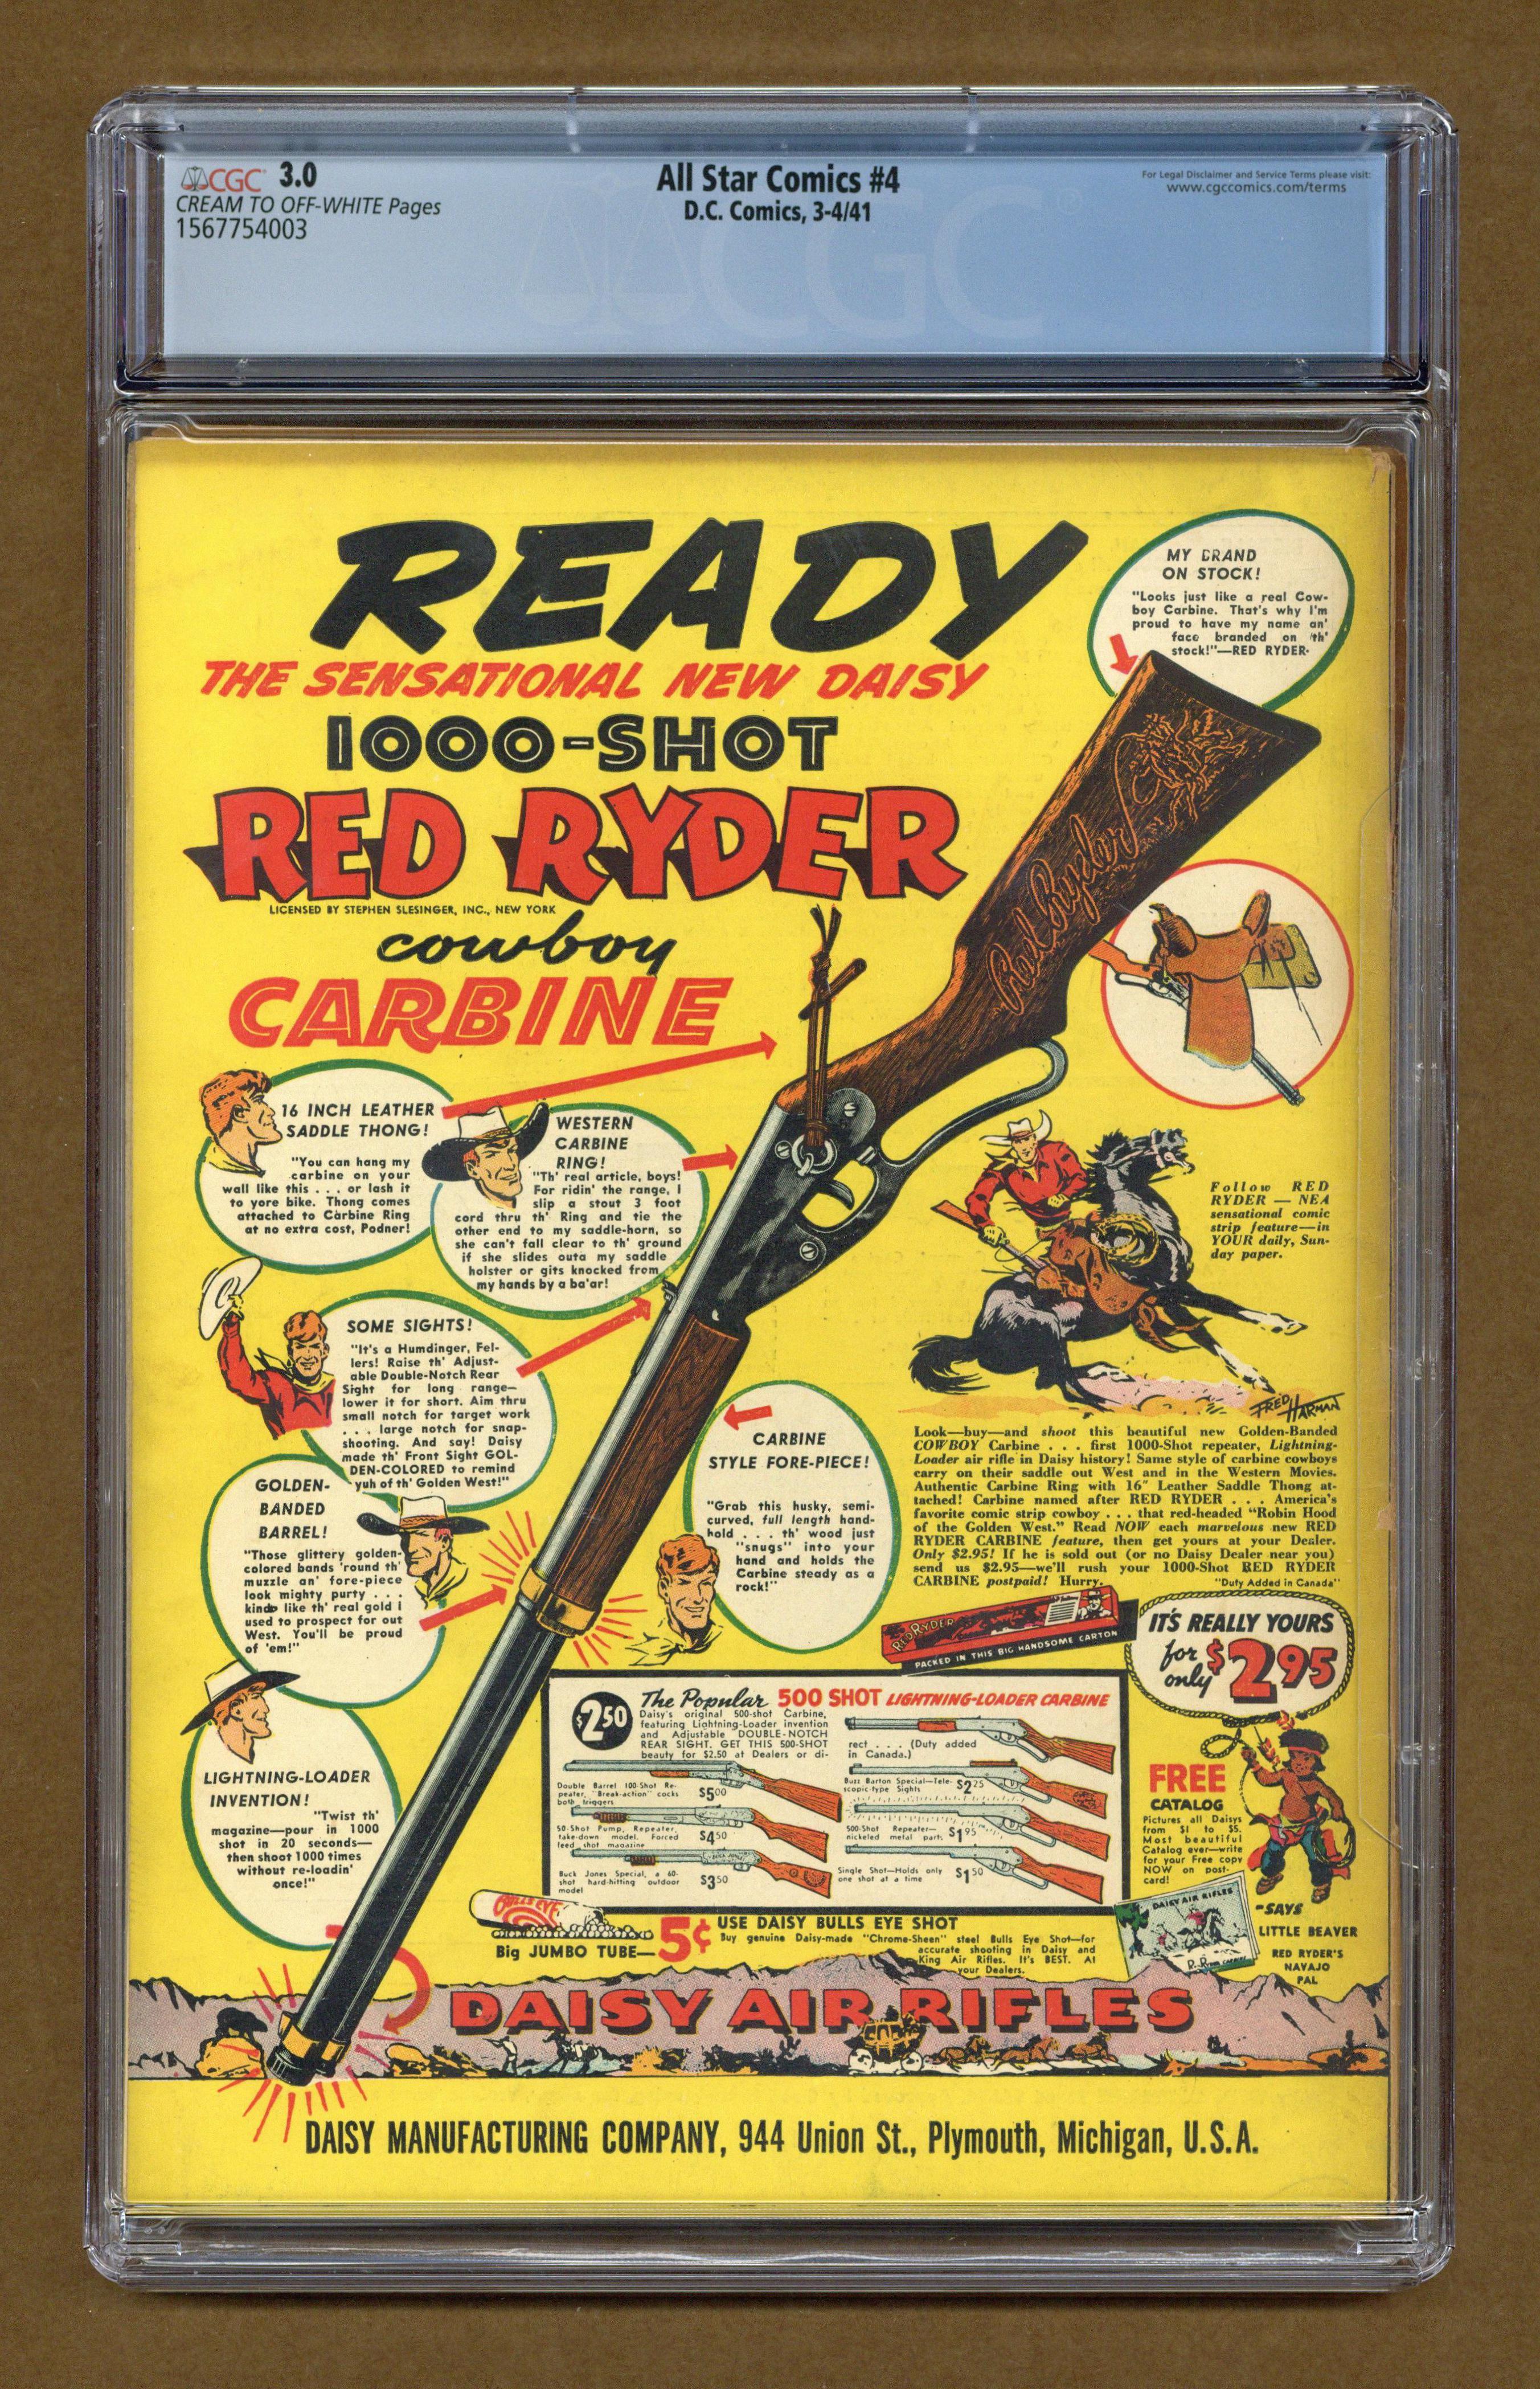 All-Star-Comics-4-CGC-3-0-1941-1567754003 thumbnail 2